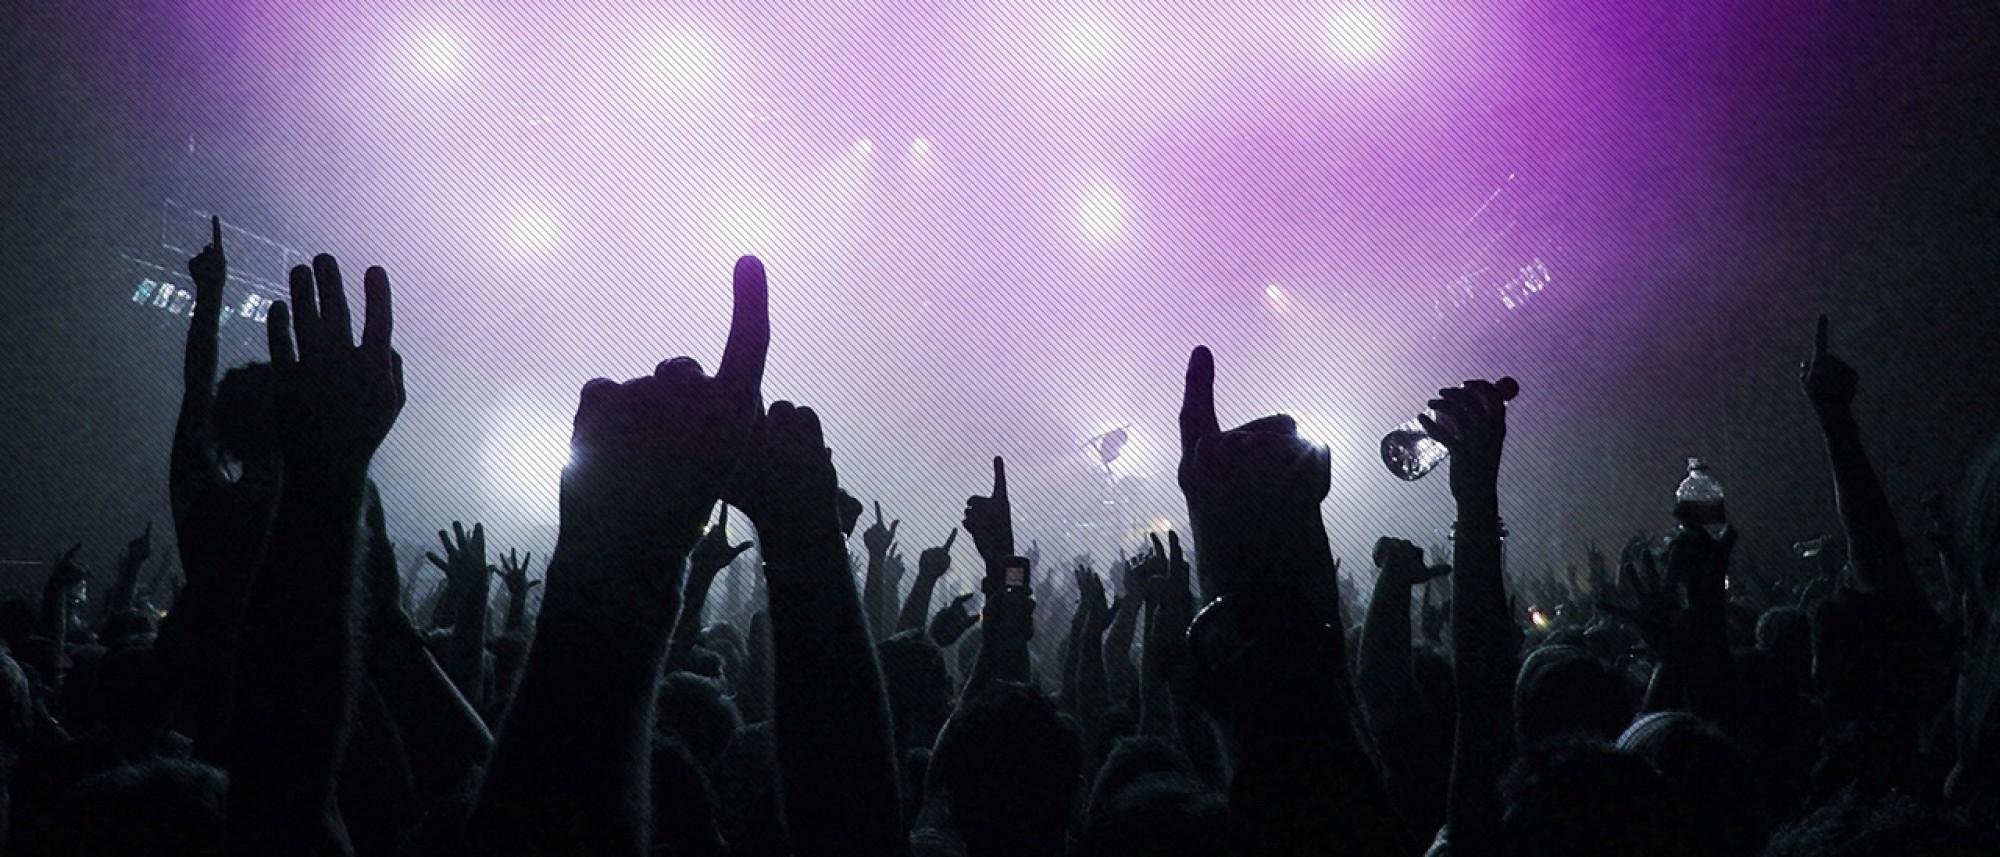 @Musicwand